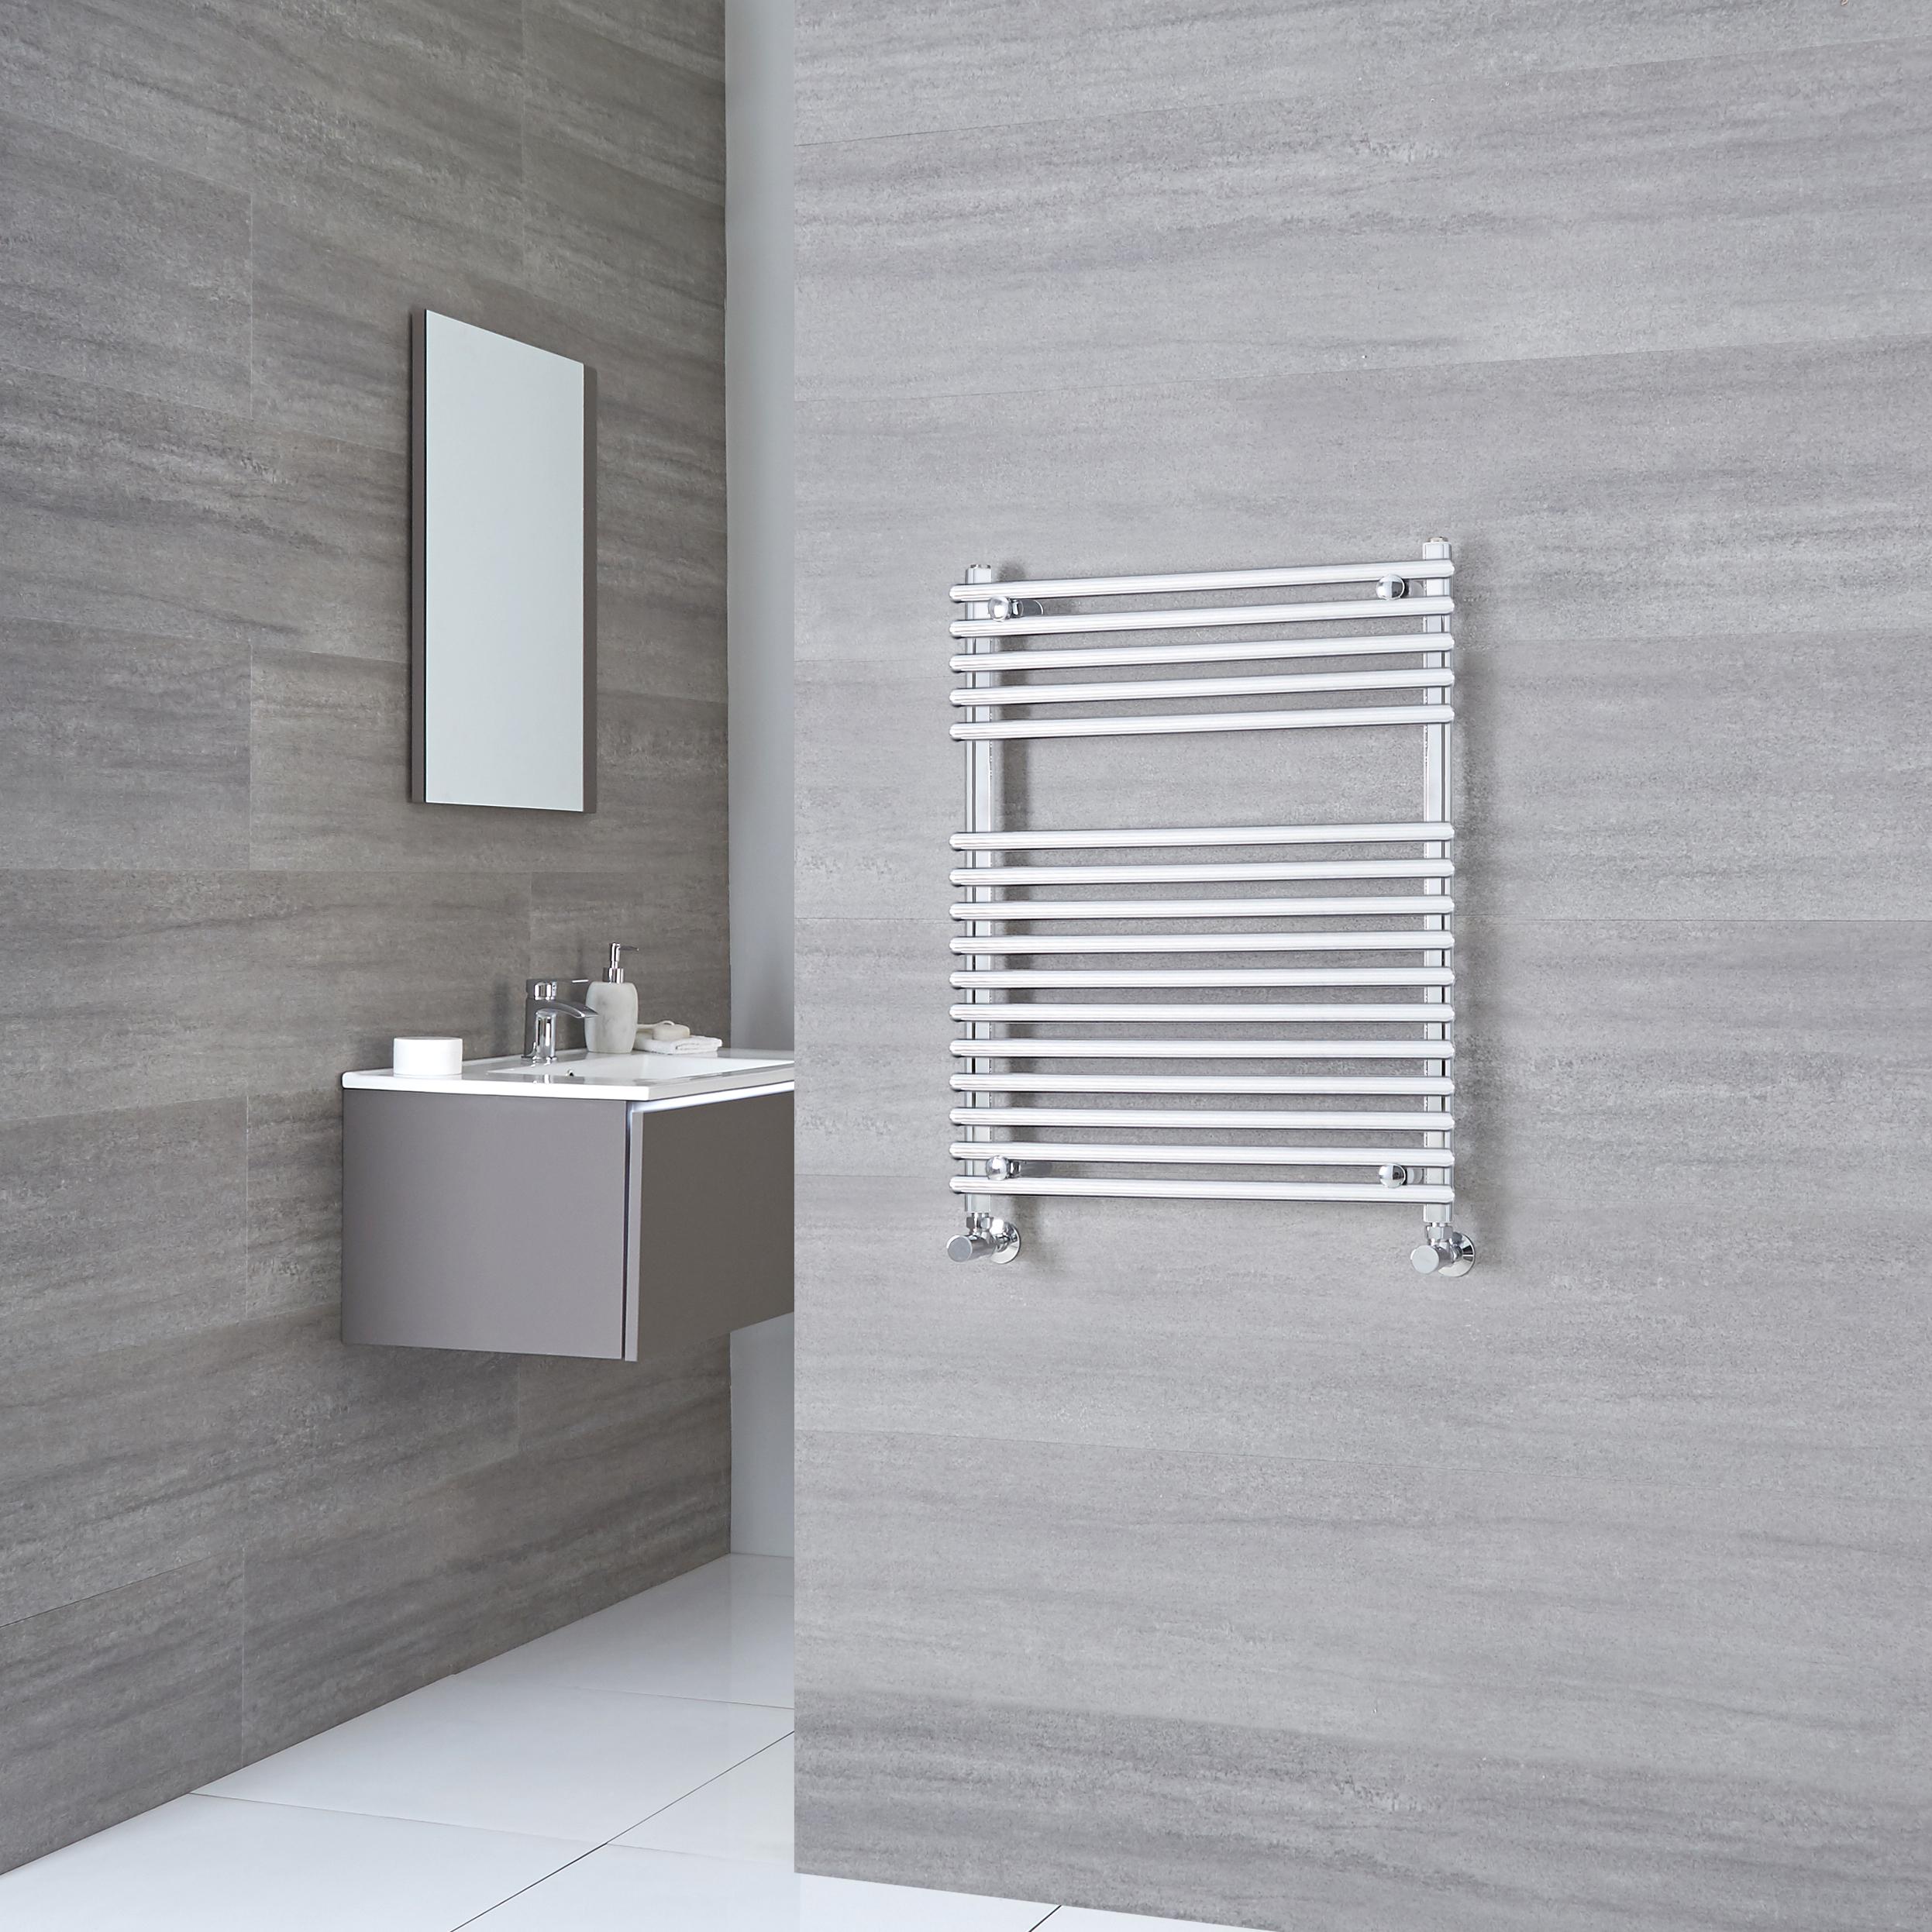 Kudox Harrogate - Chrome Flat Bar on Bar Heated Towel Rail - 750mm x 600mm